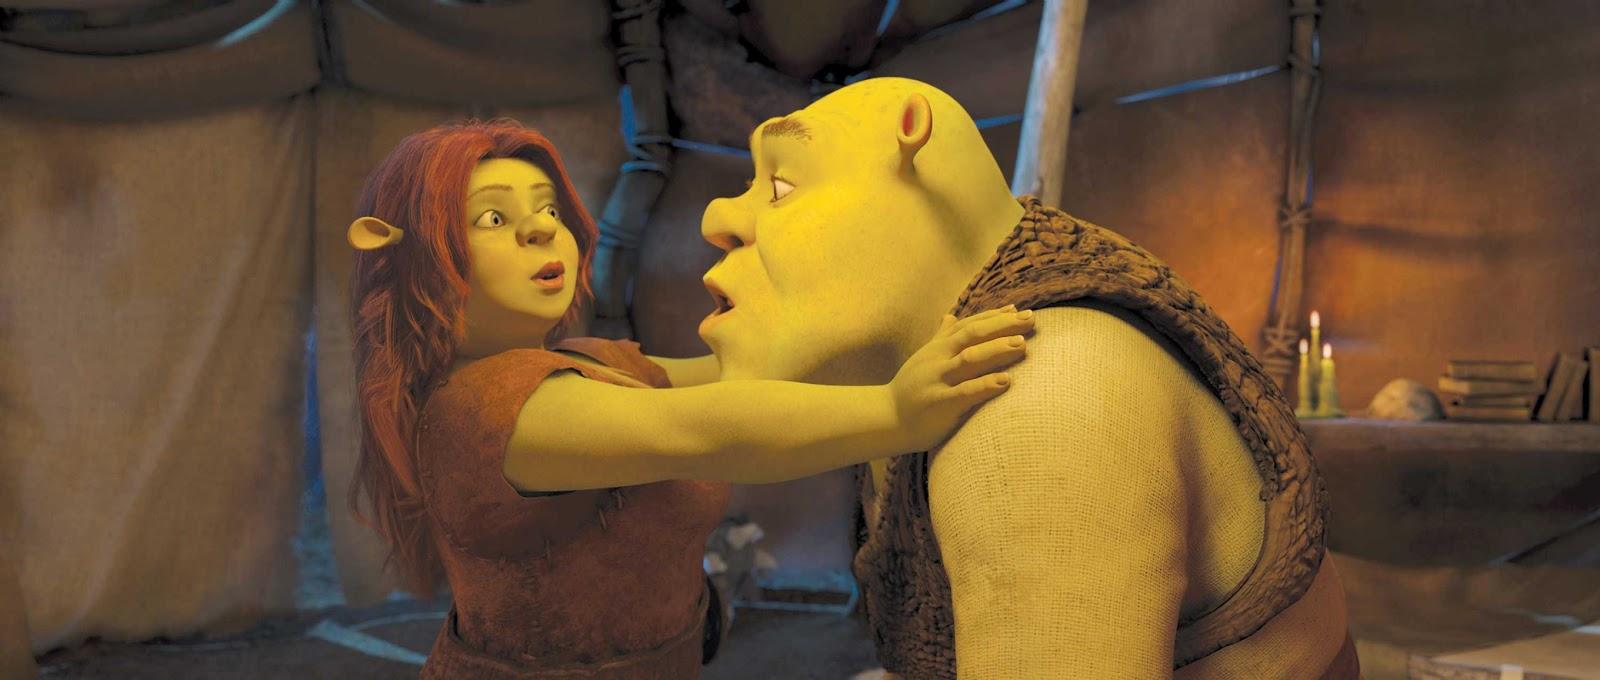 Fiona Shrek Shrek Forever After 2010 animatedfilmreviews.filminspector.com